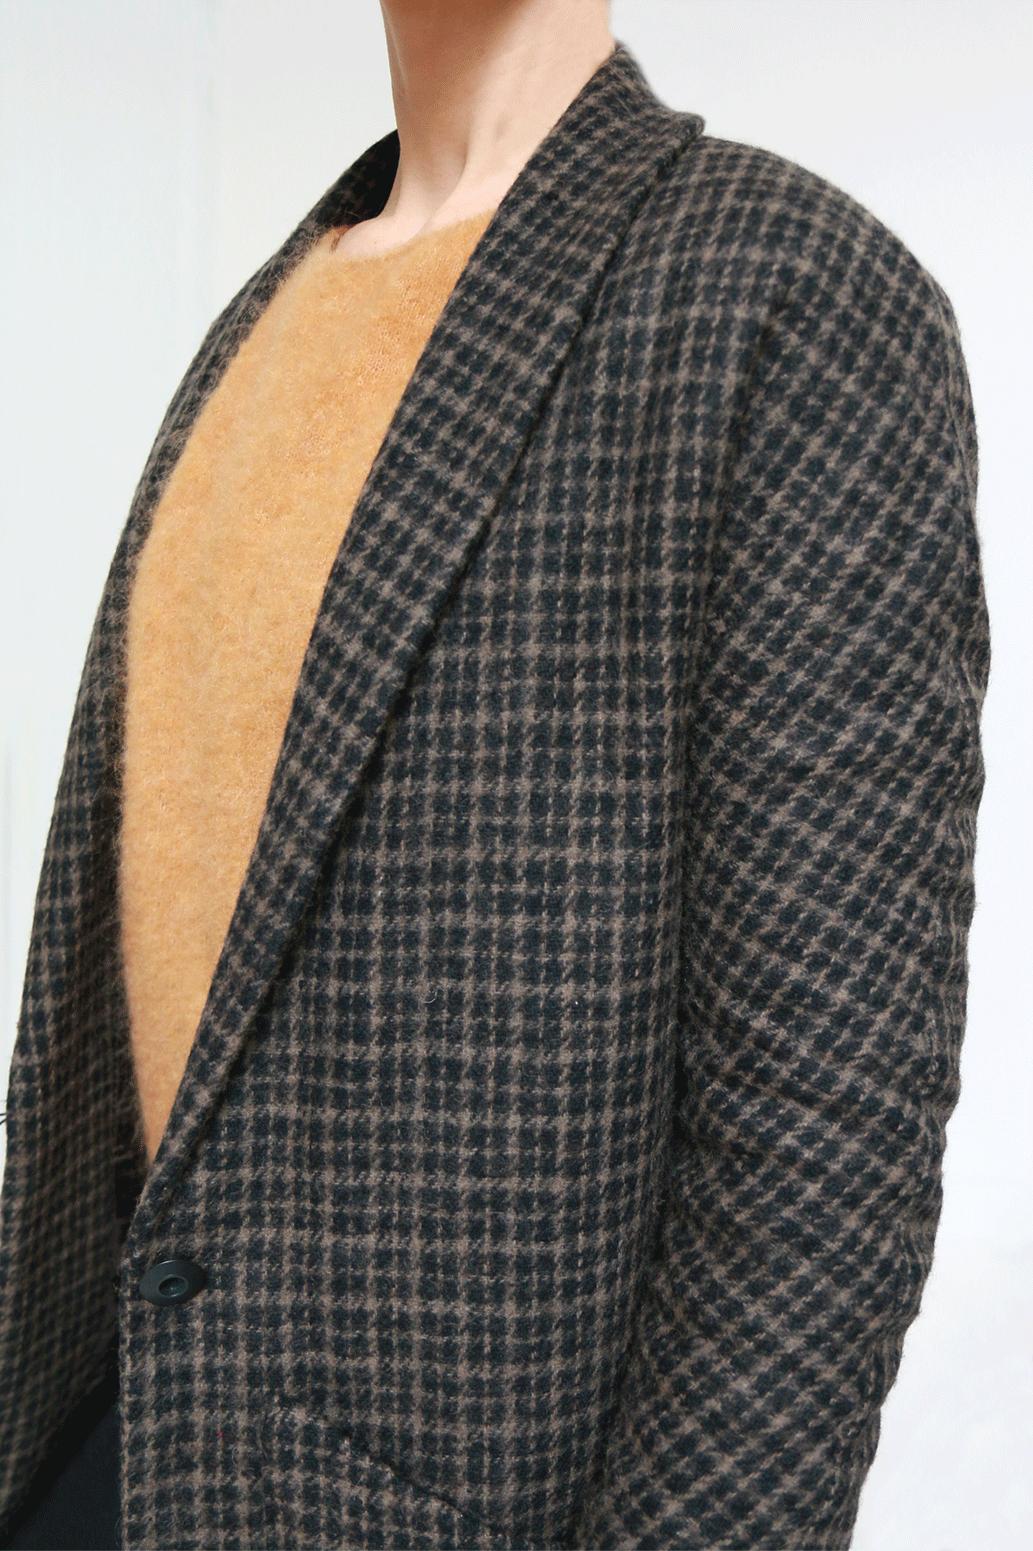 3-manteau-franceduvalstalla-anna-ka-bazaar-patron-couture-atelier-scammit